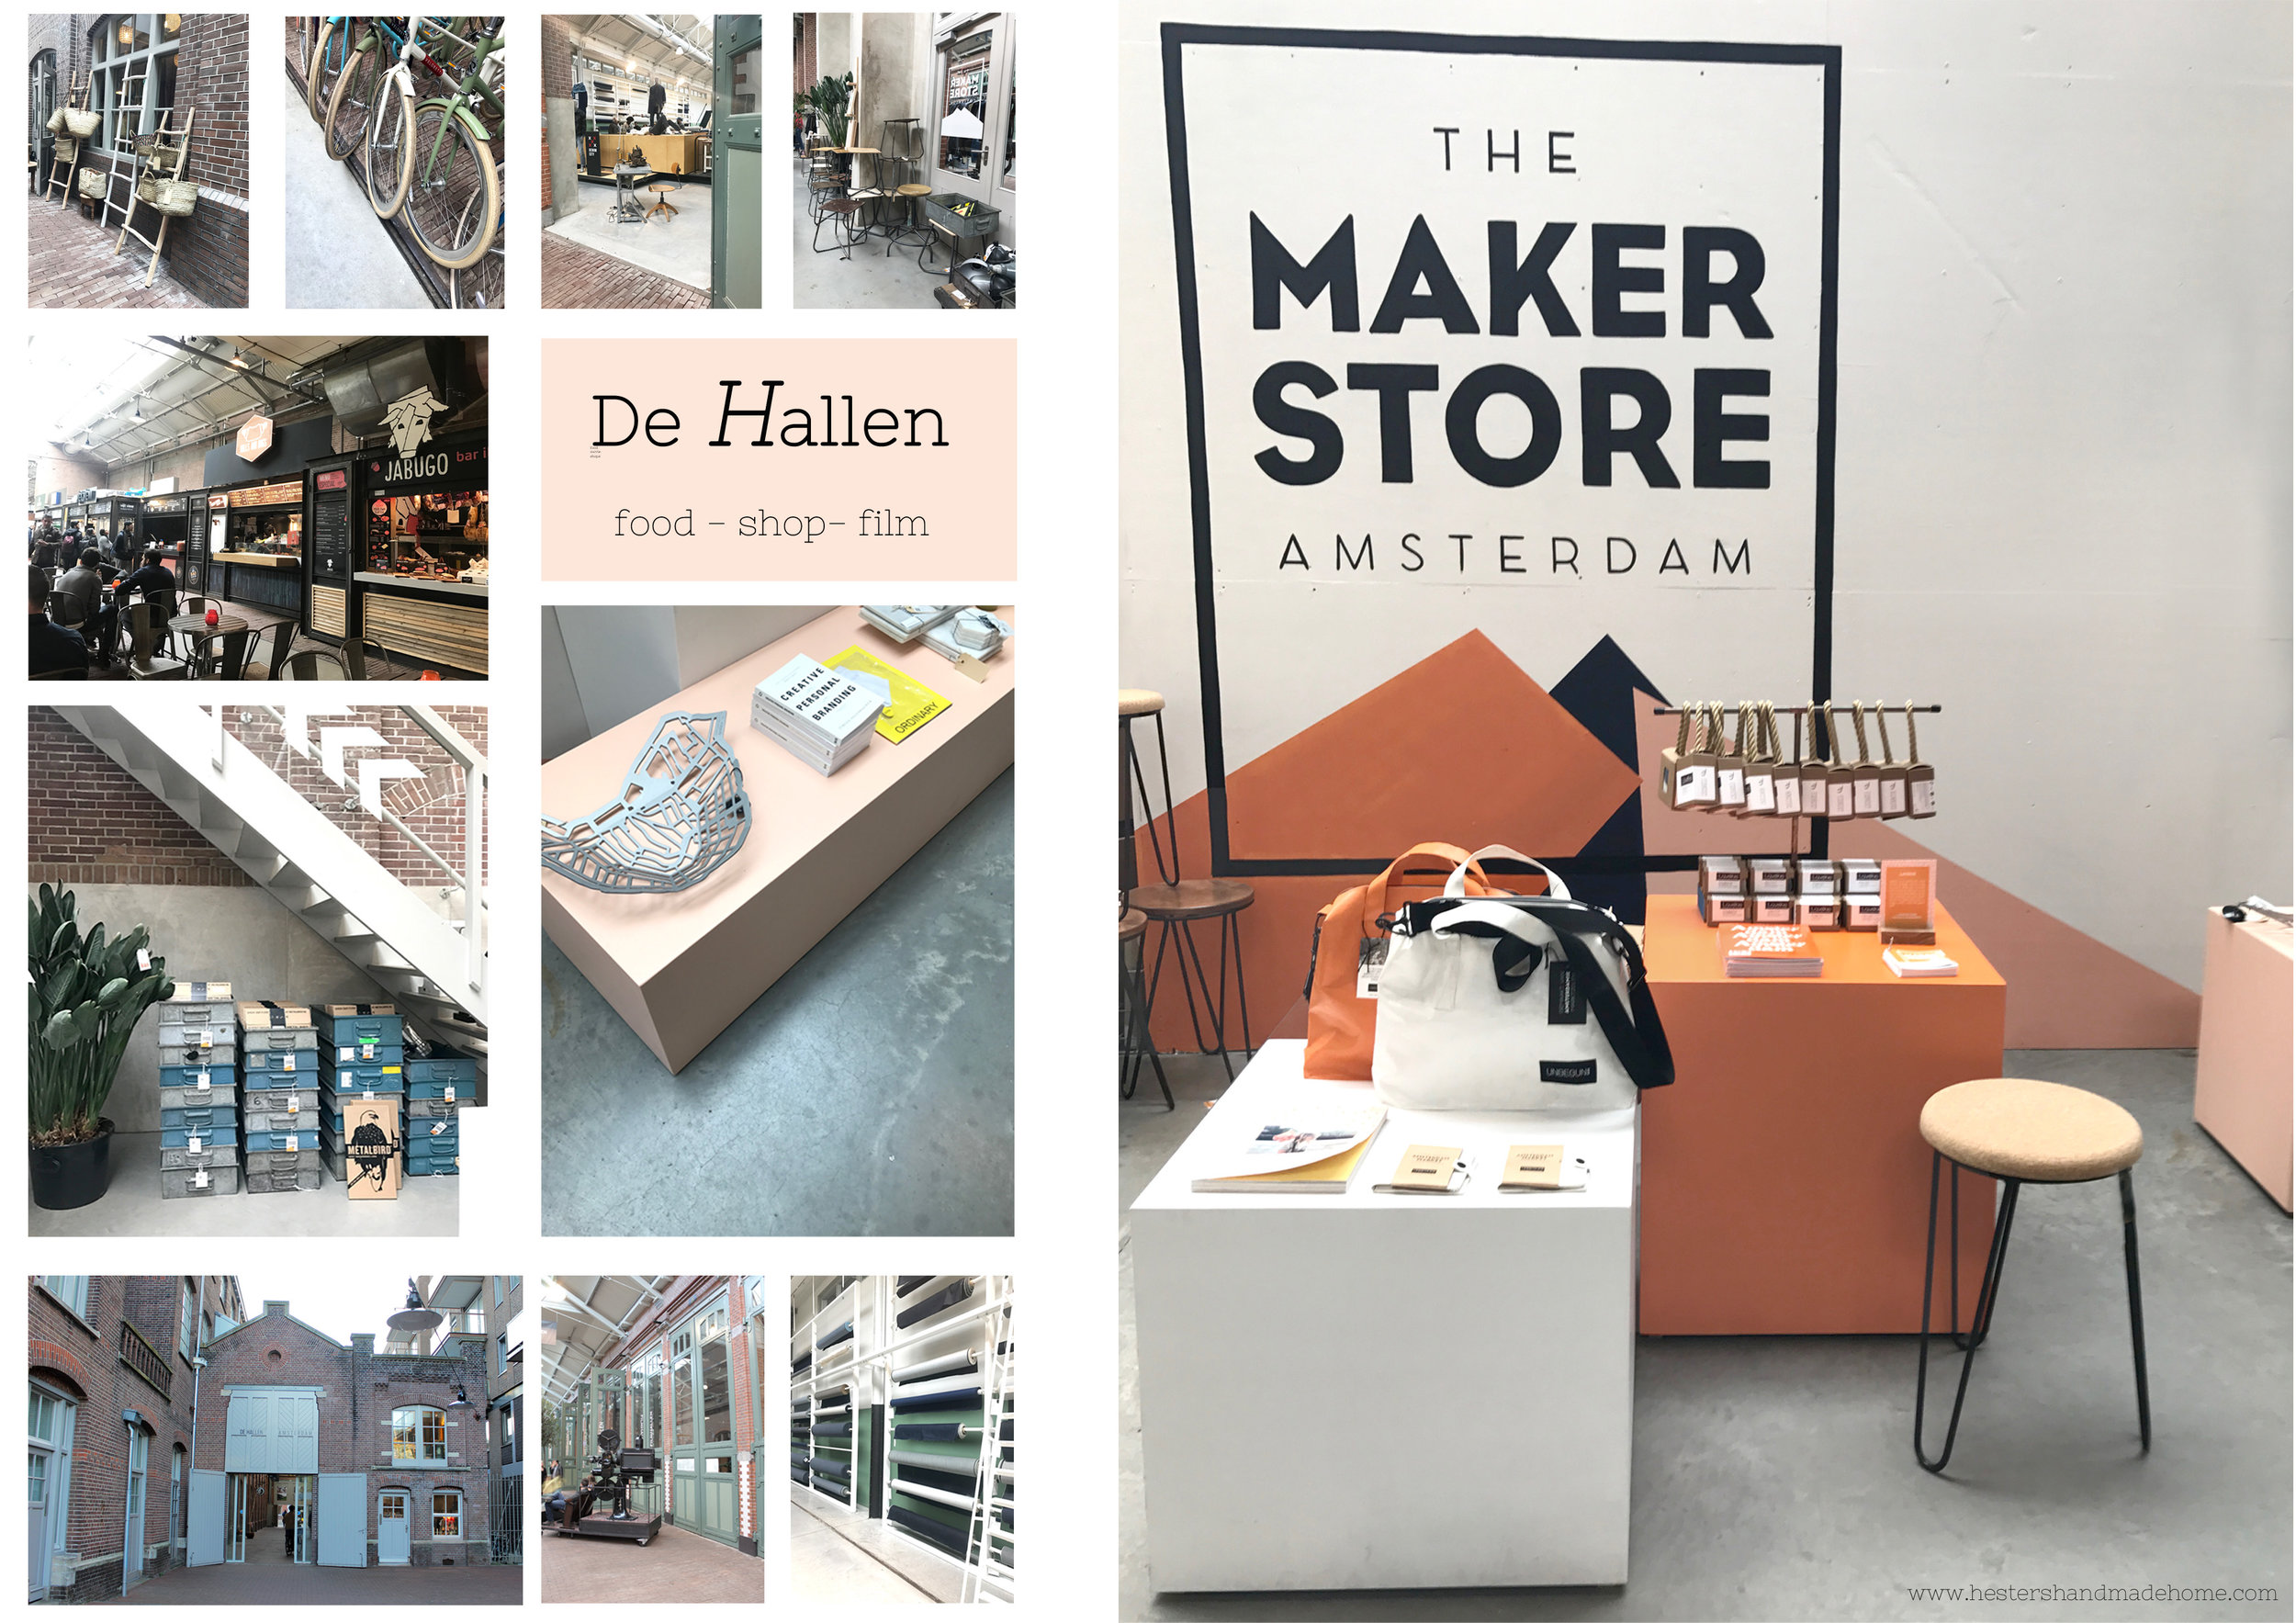 de Hallen Amsterdam city guide by HHH